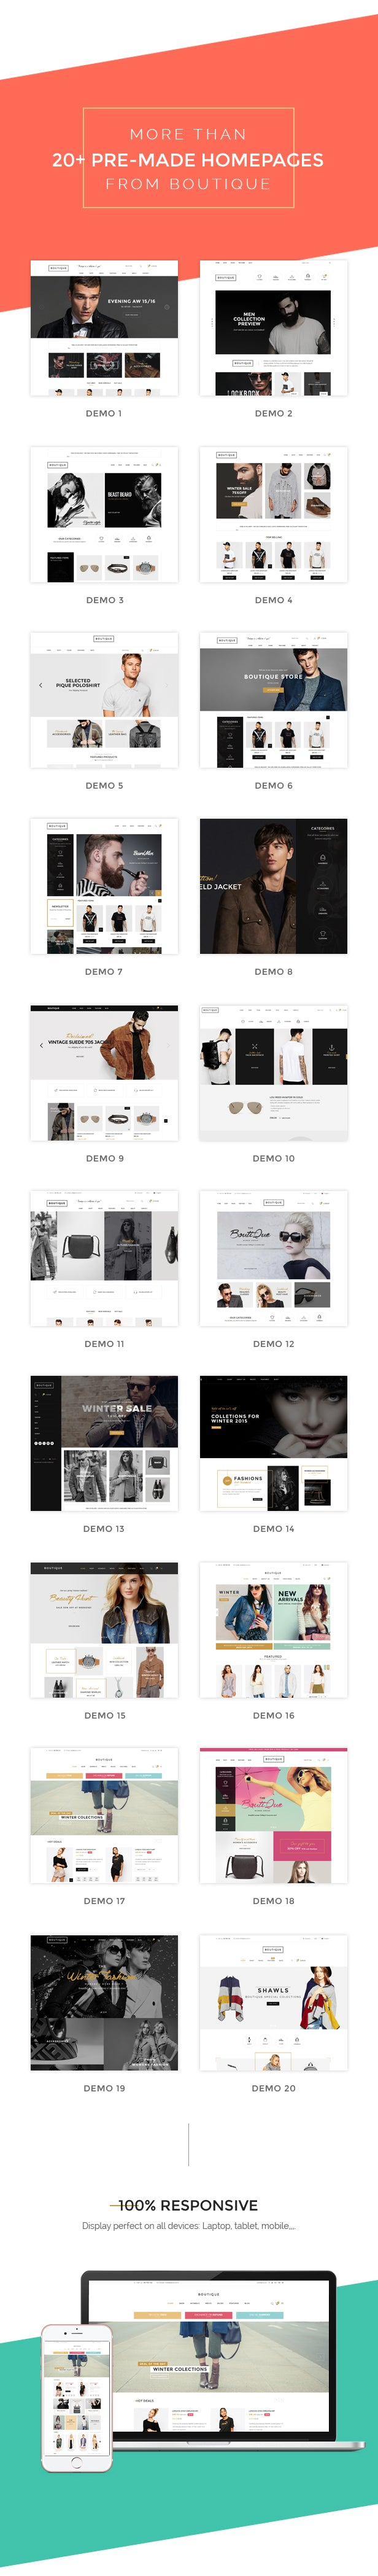 Boutique - Responsive Shopify Theme - 12